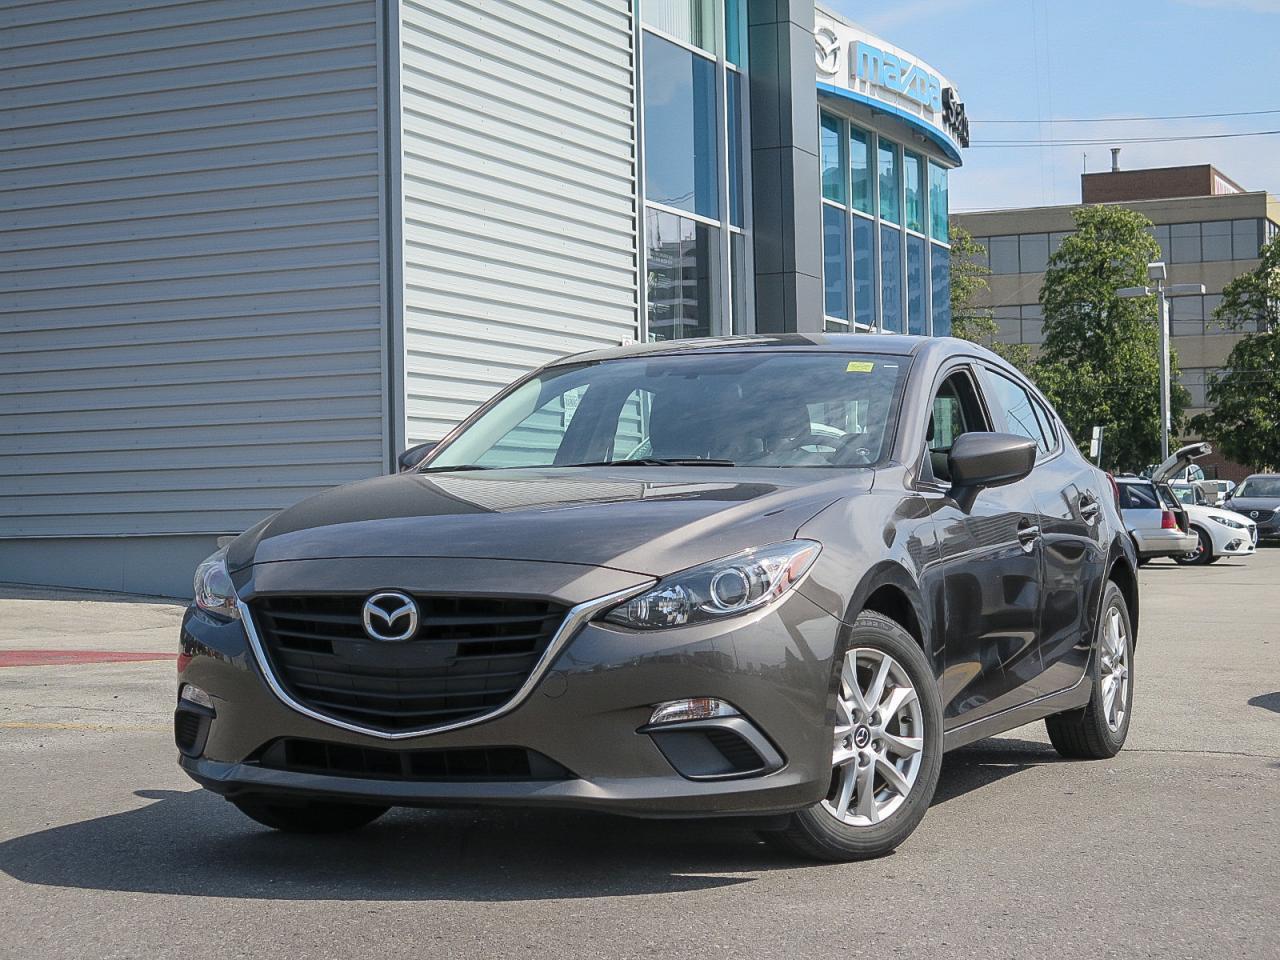 2014 Mazda MAZDA3 GS SKY HEATED SEATS 0.9% FINANCE!!!